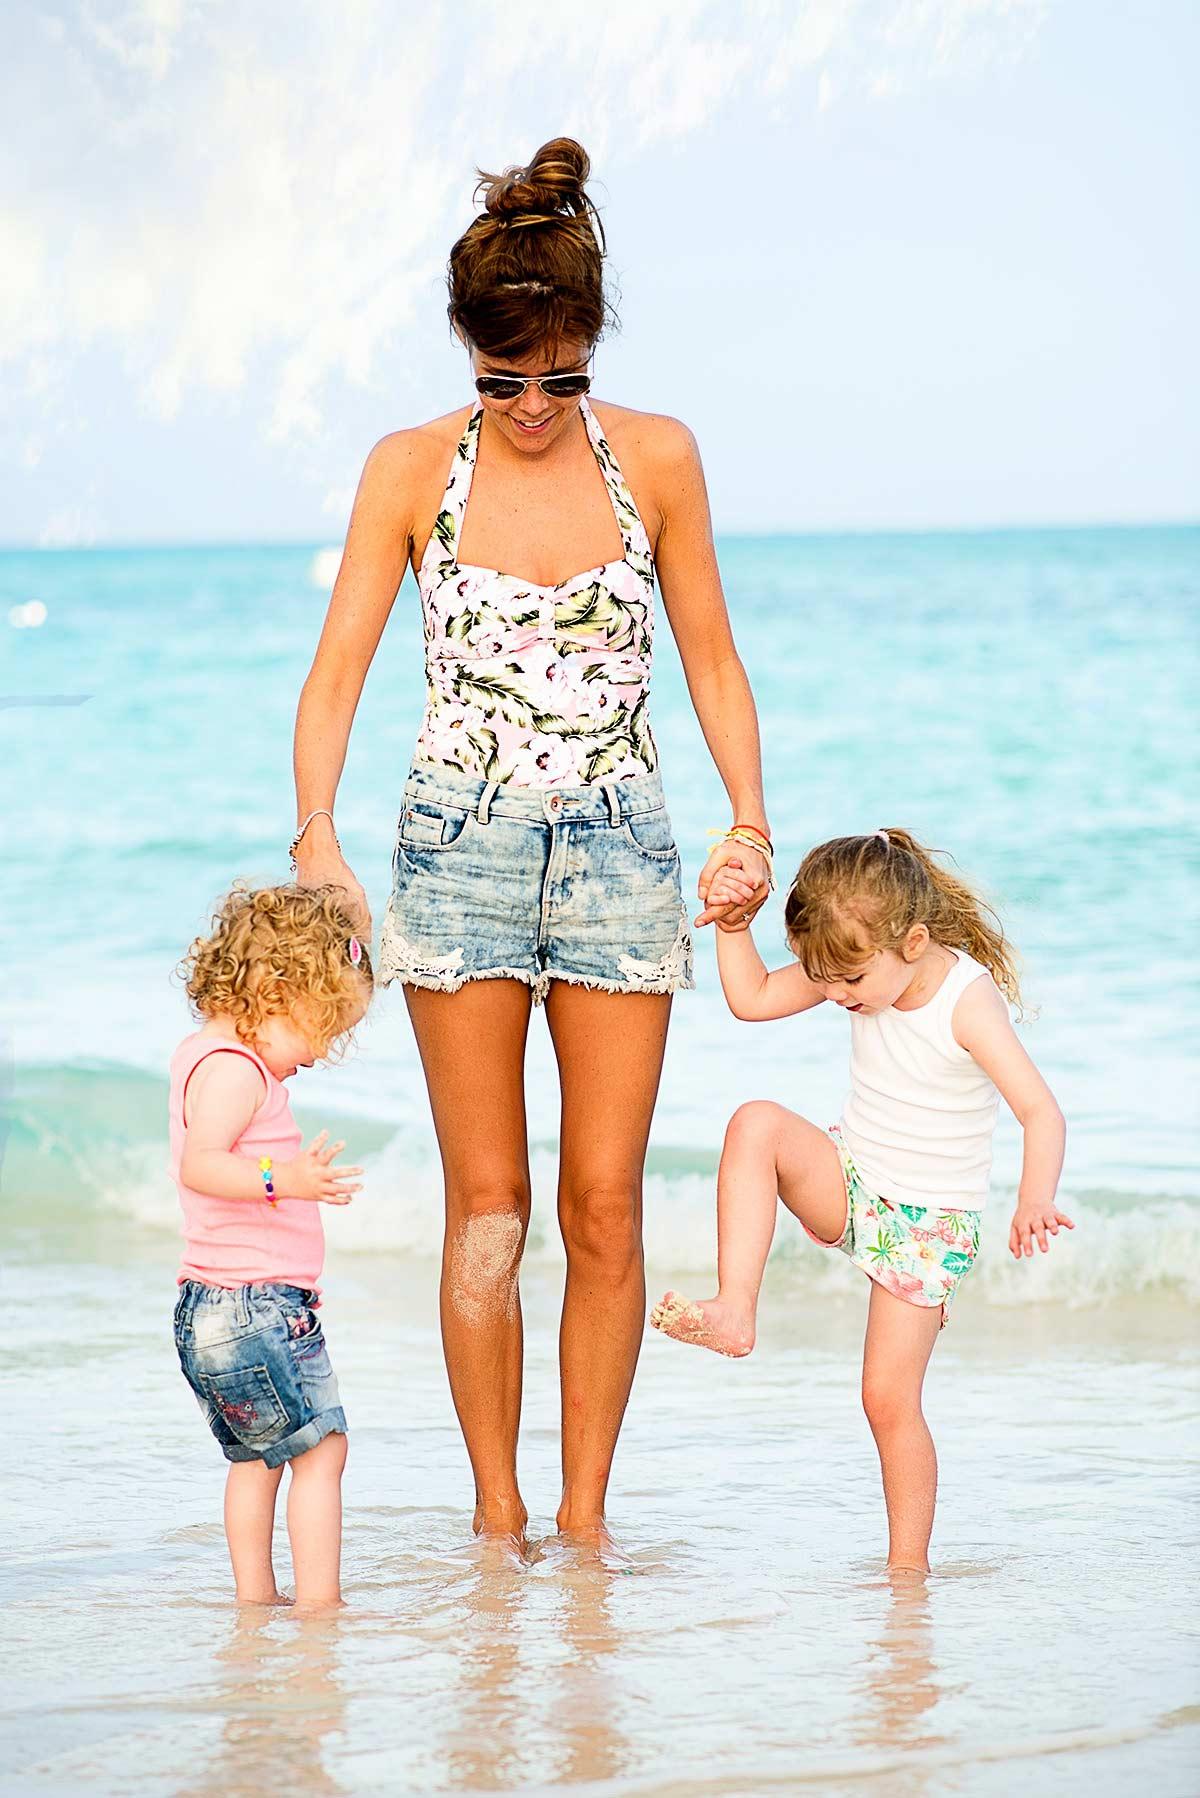 beaches turks and caicos 16a